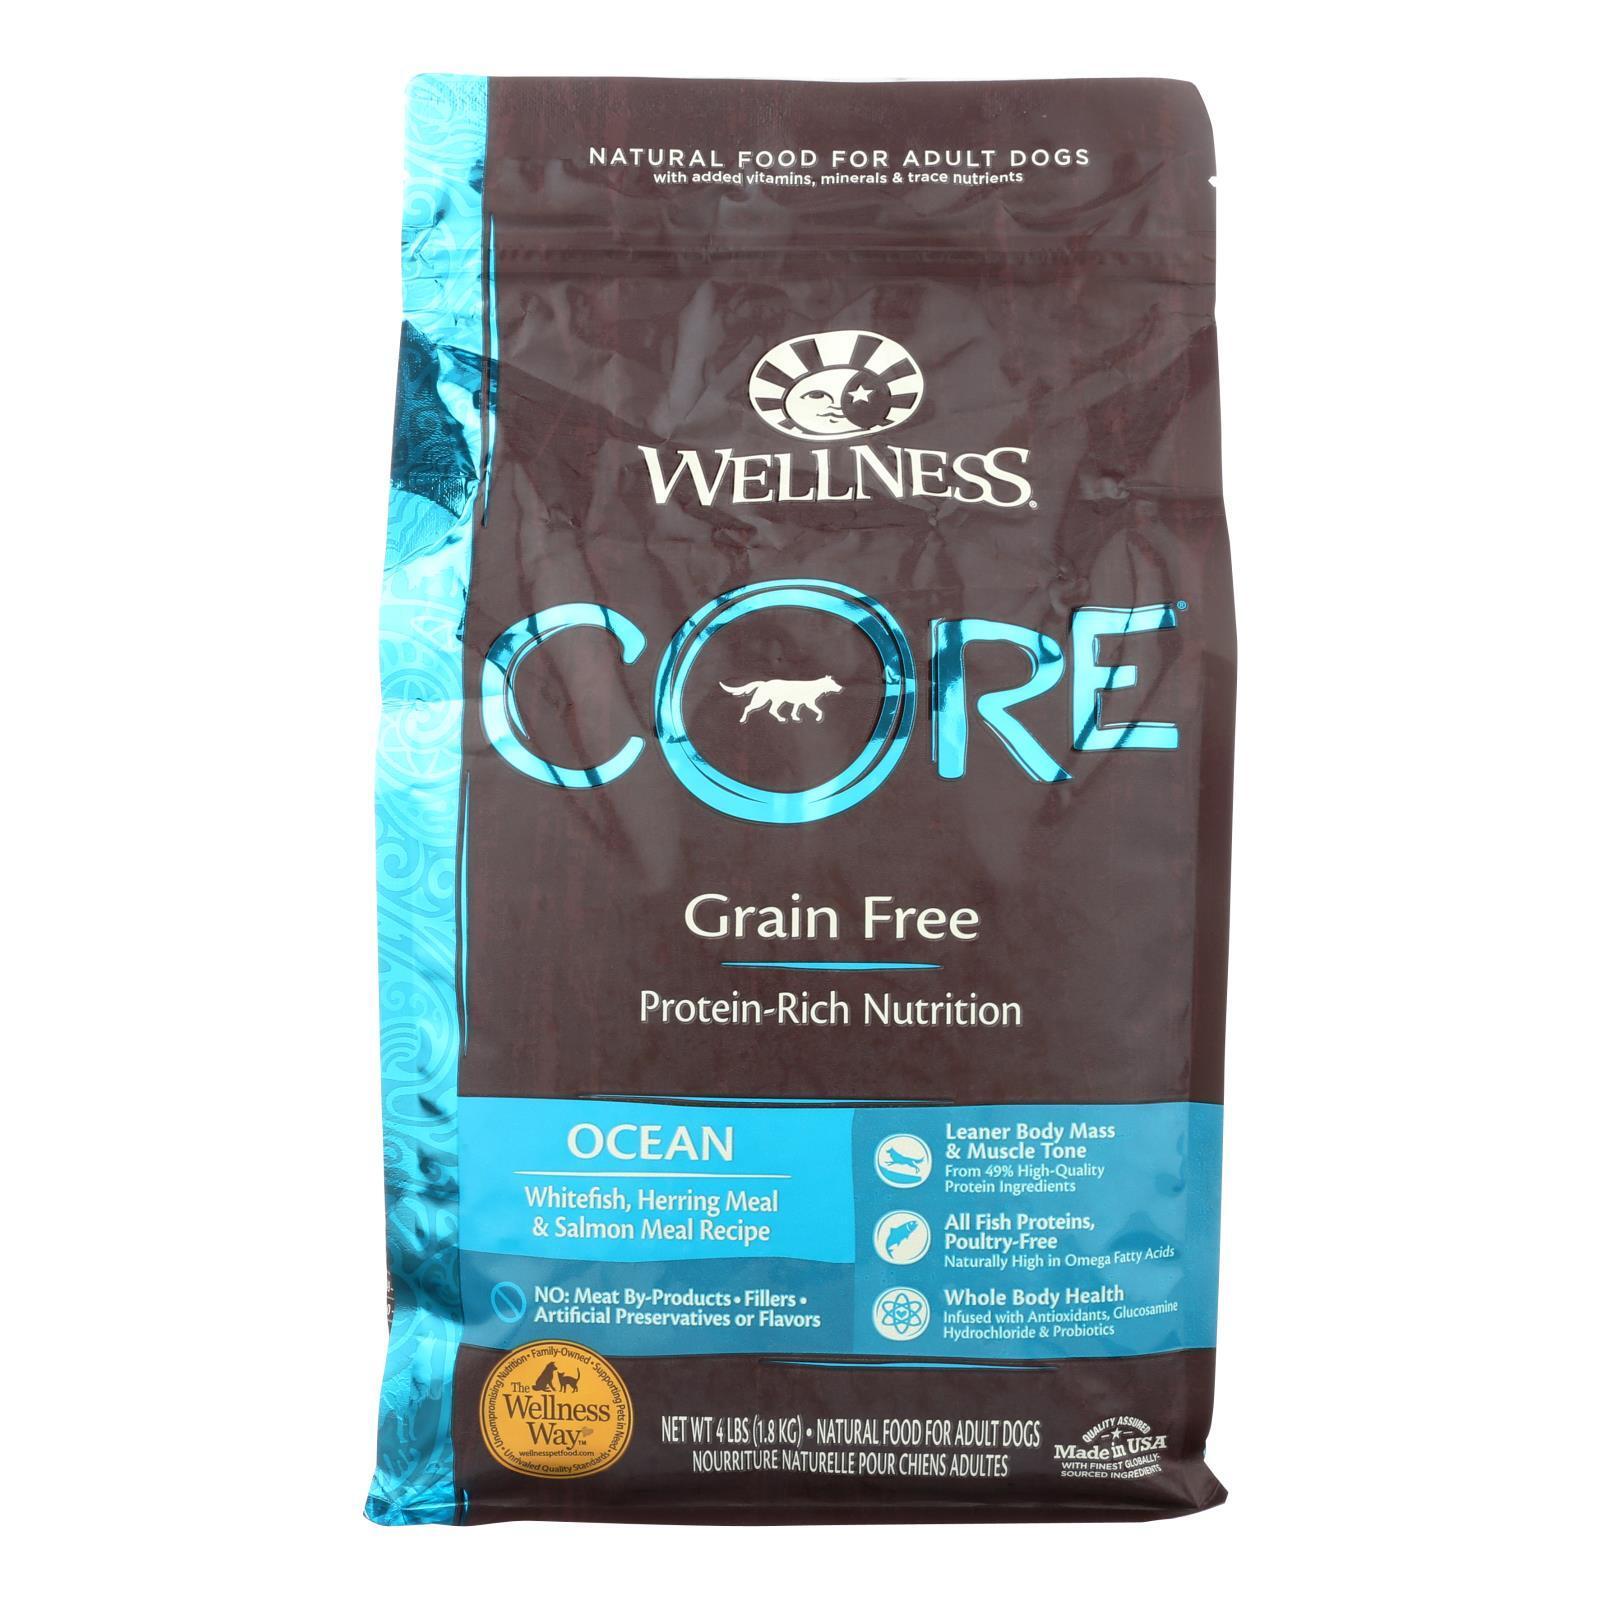 Wellness Pet Products Dog Food - Ocean Formula - Case of 6 - 4 lb.